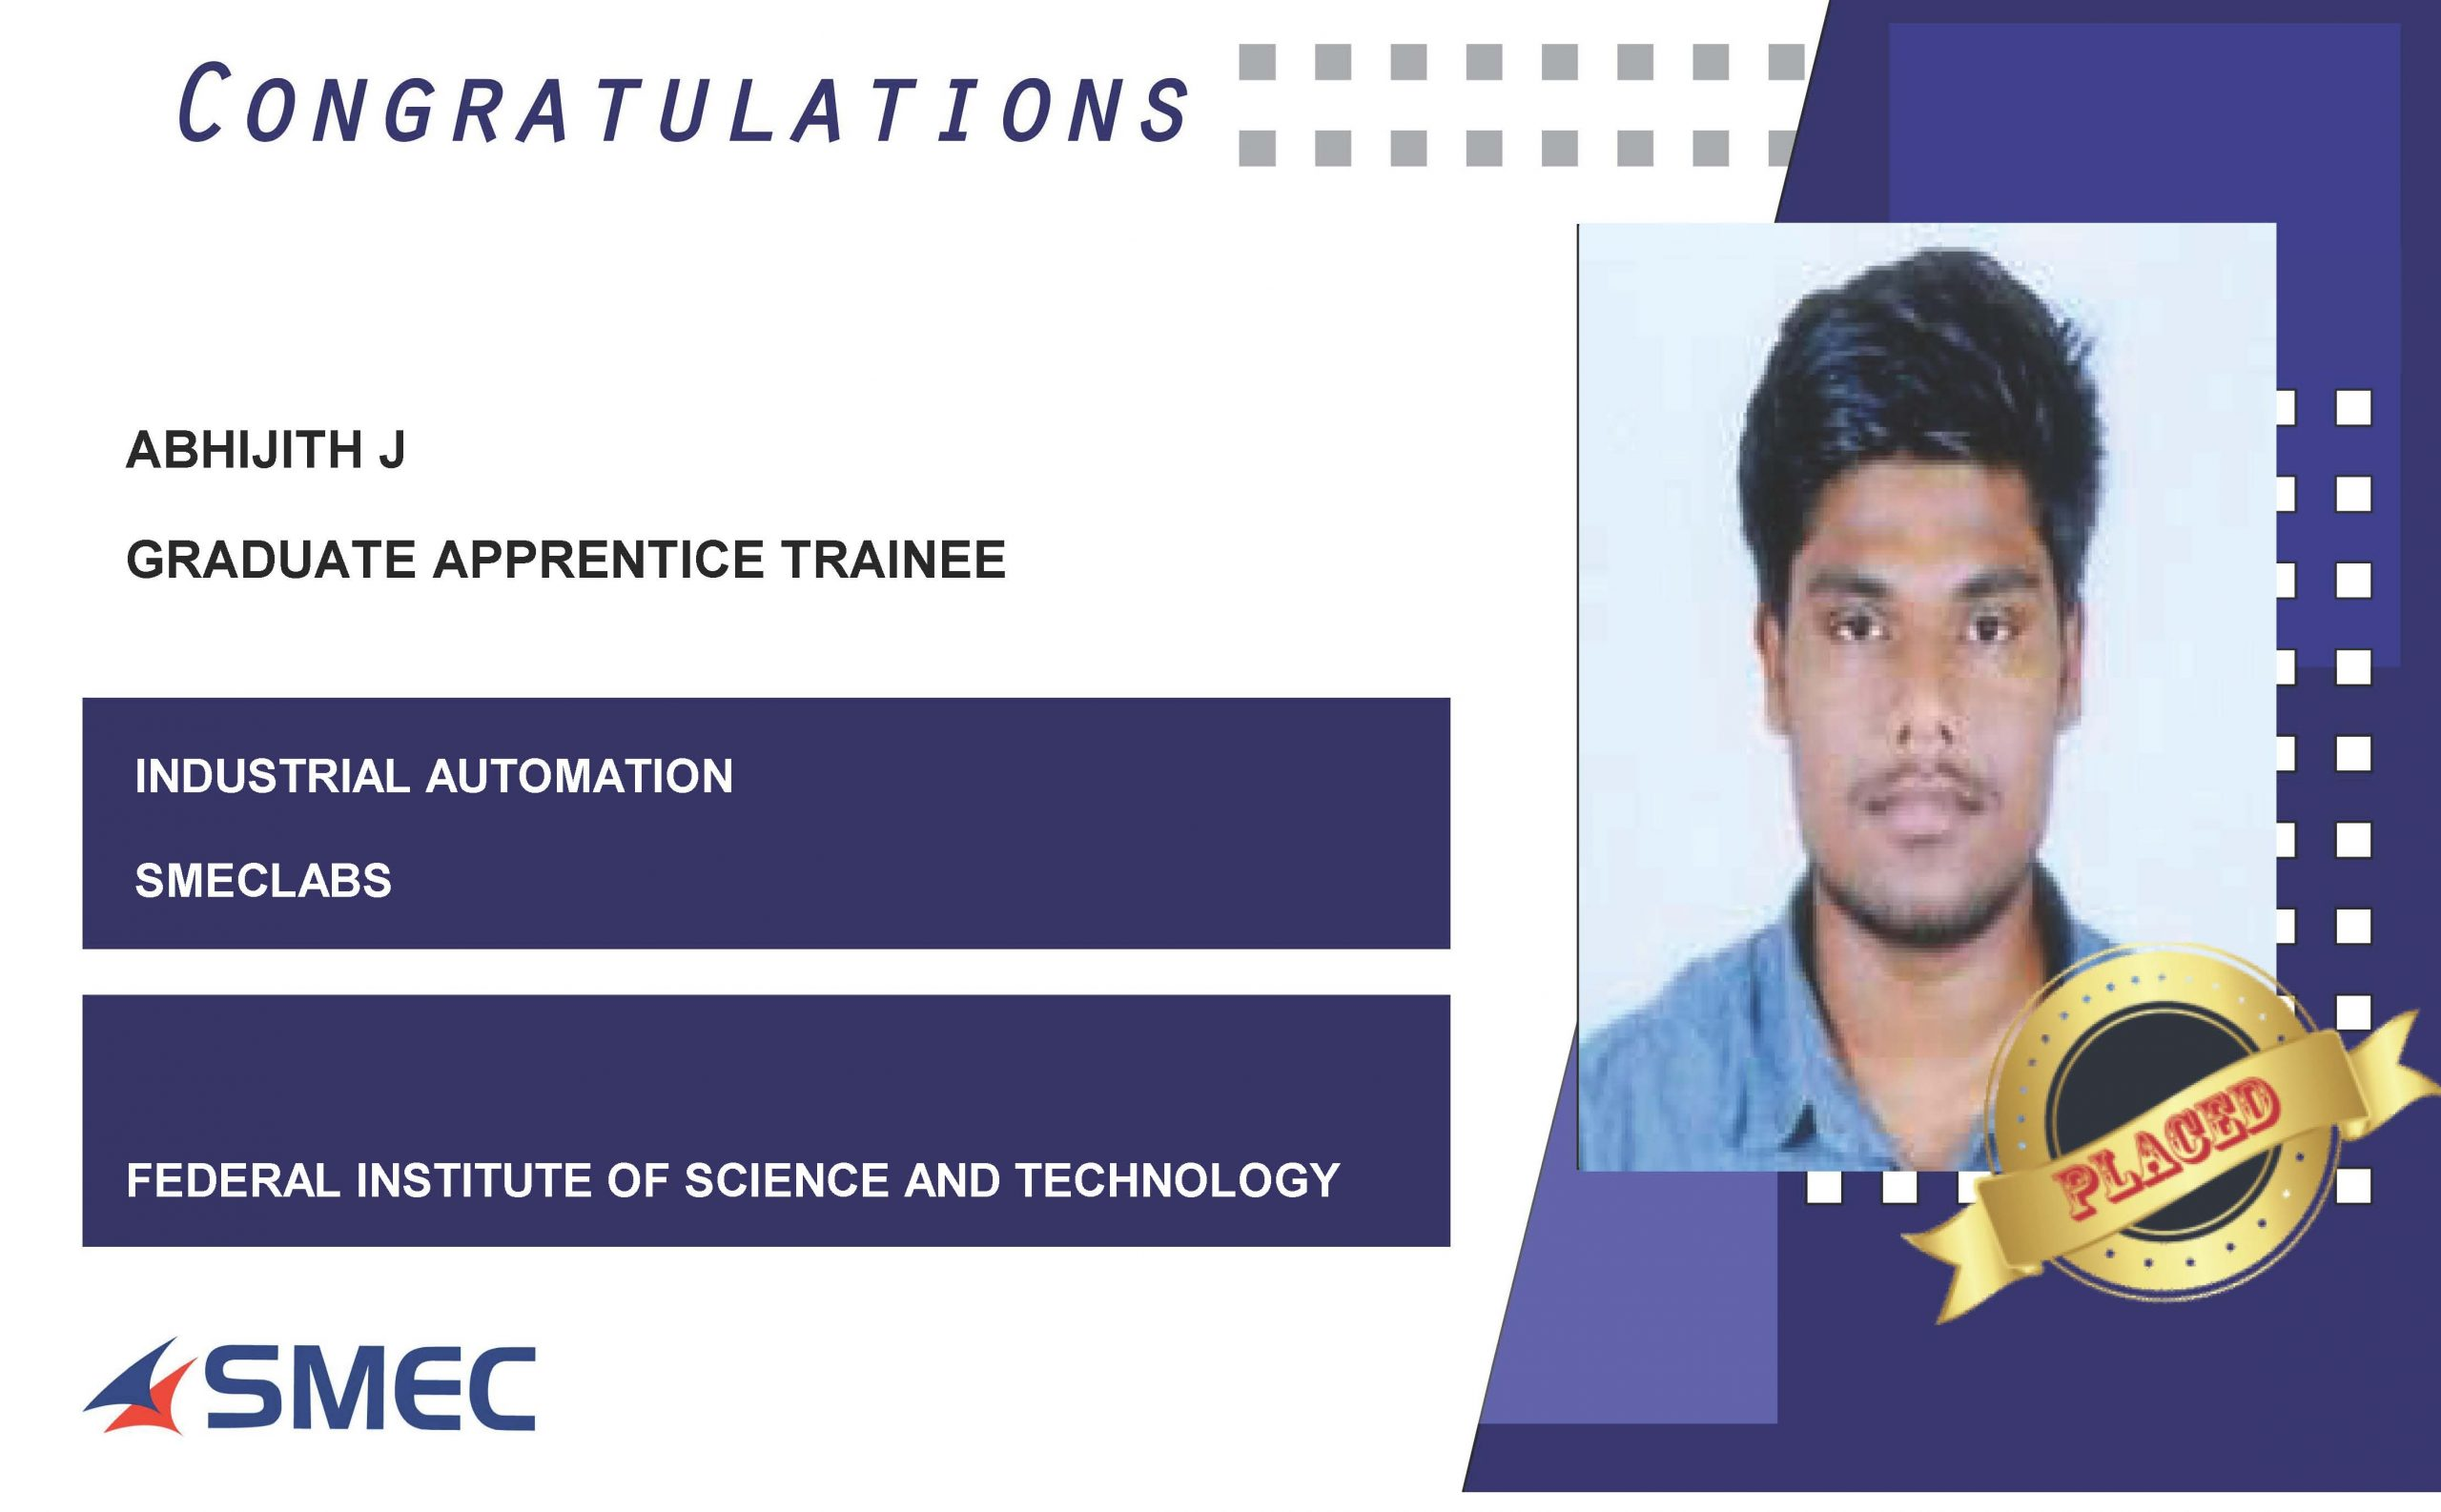 engineer trainee-abhijith j